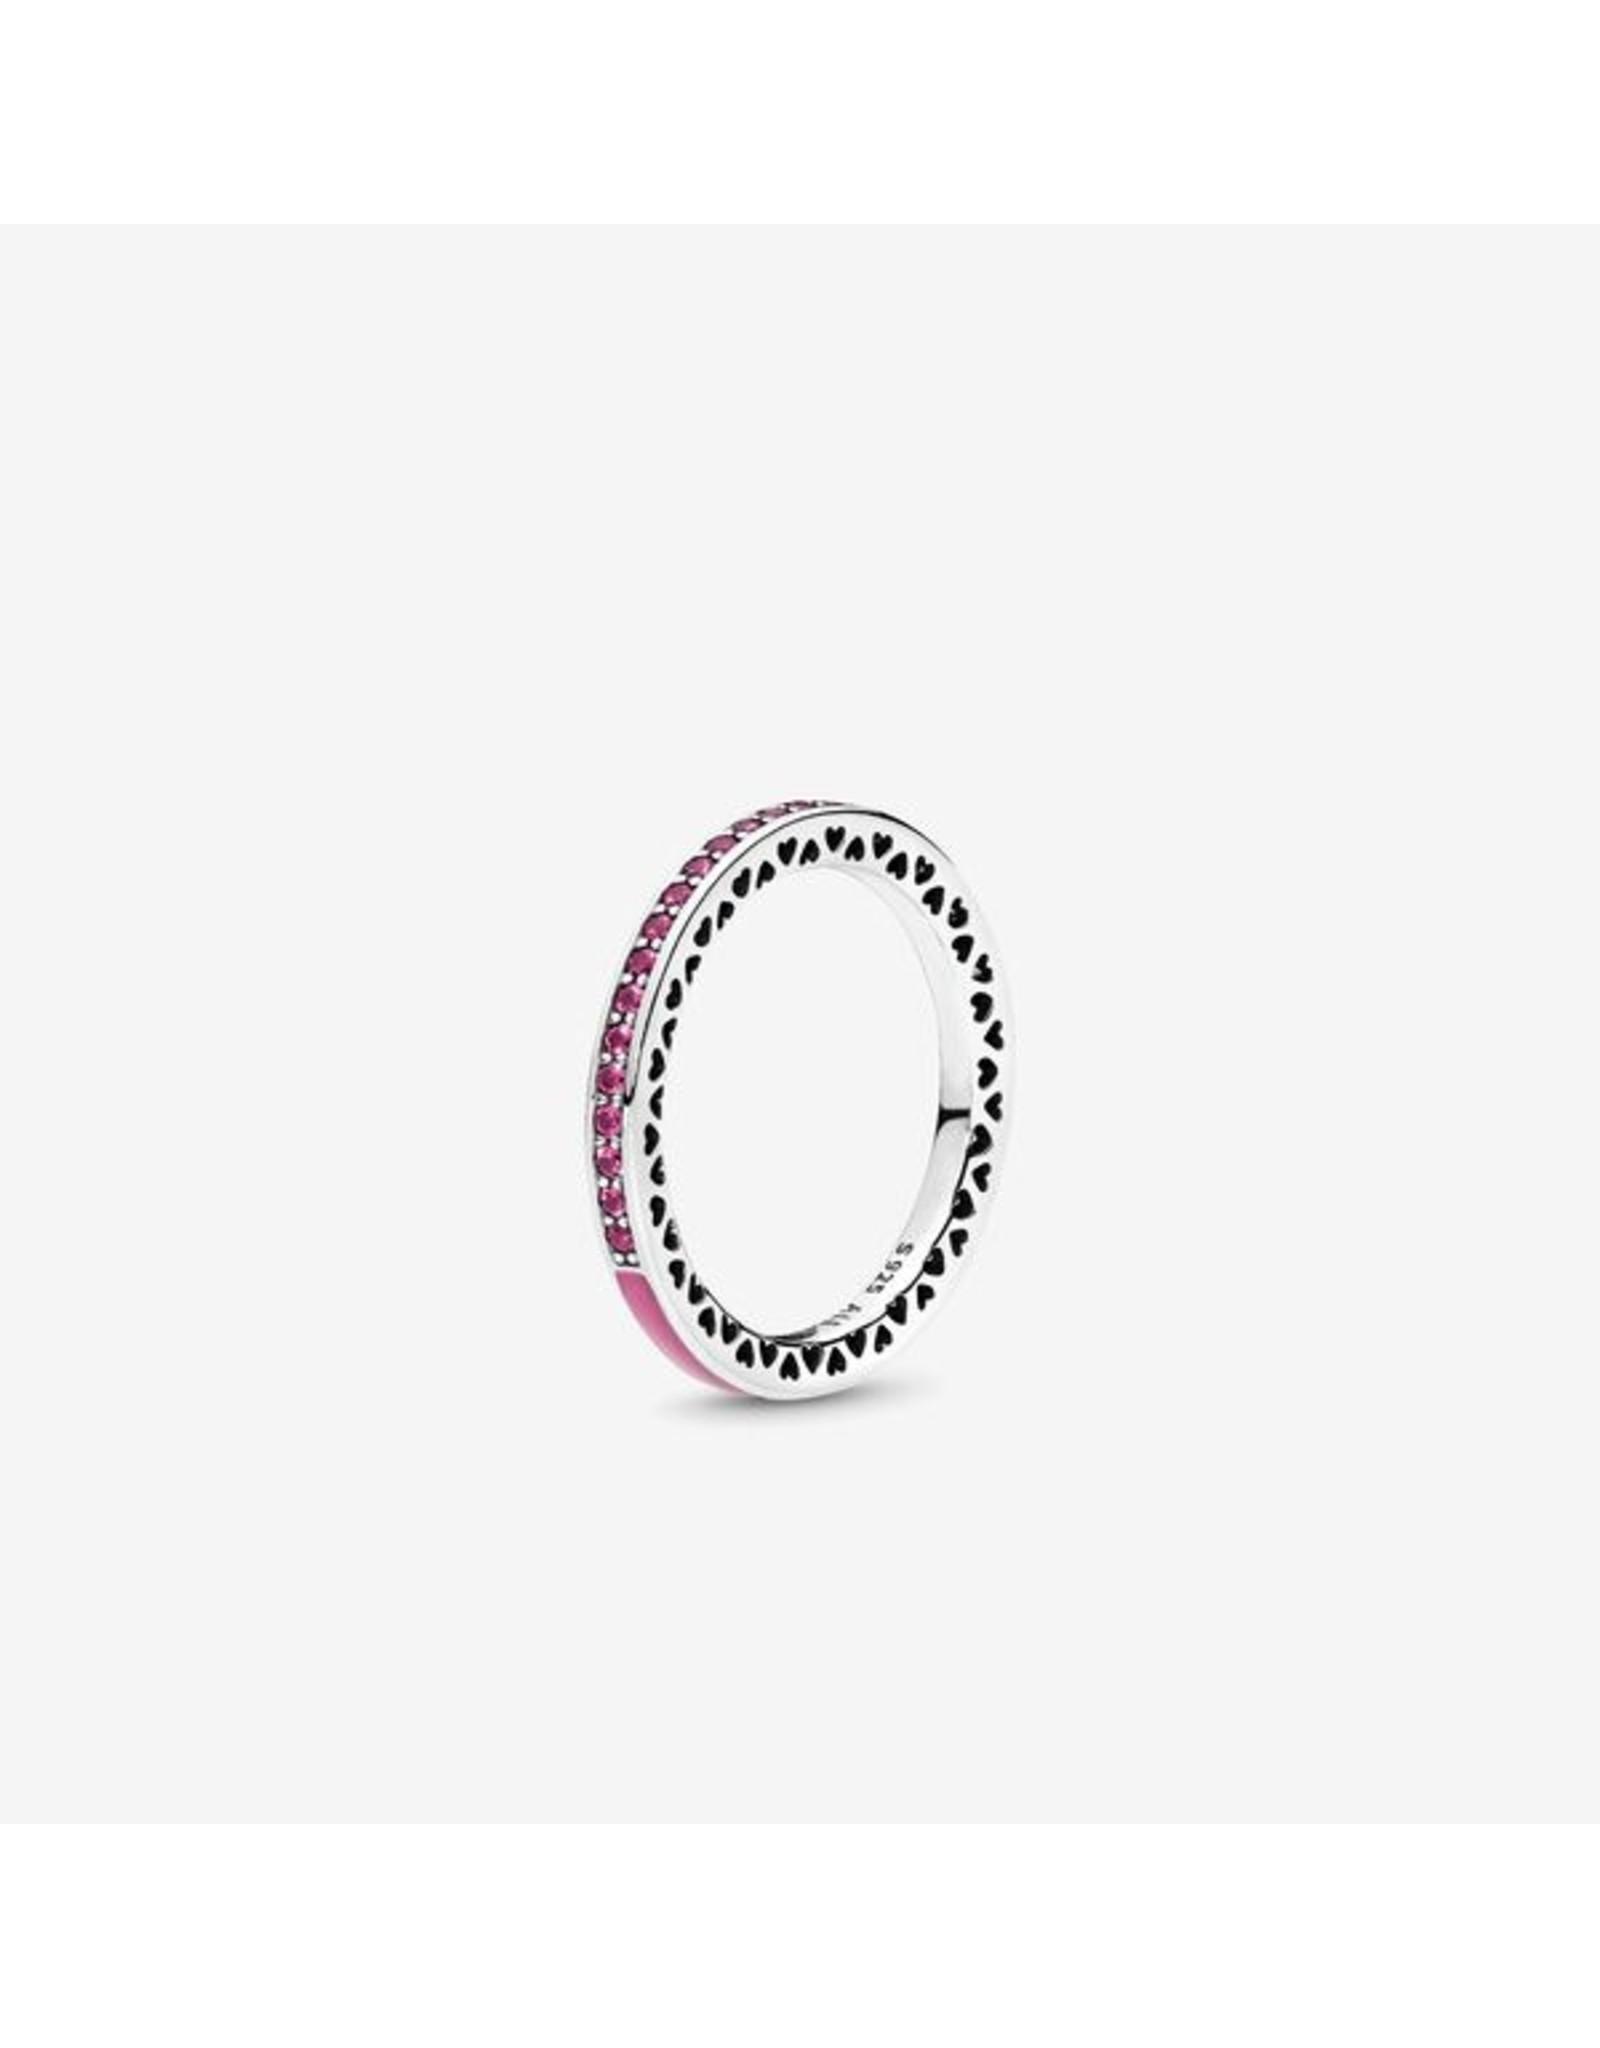 Pandora Pandora Ring, Radiant Heart Of Pandora, Cerise